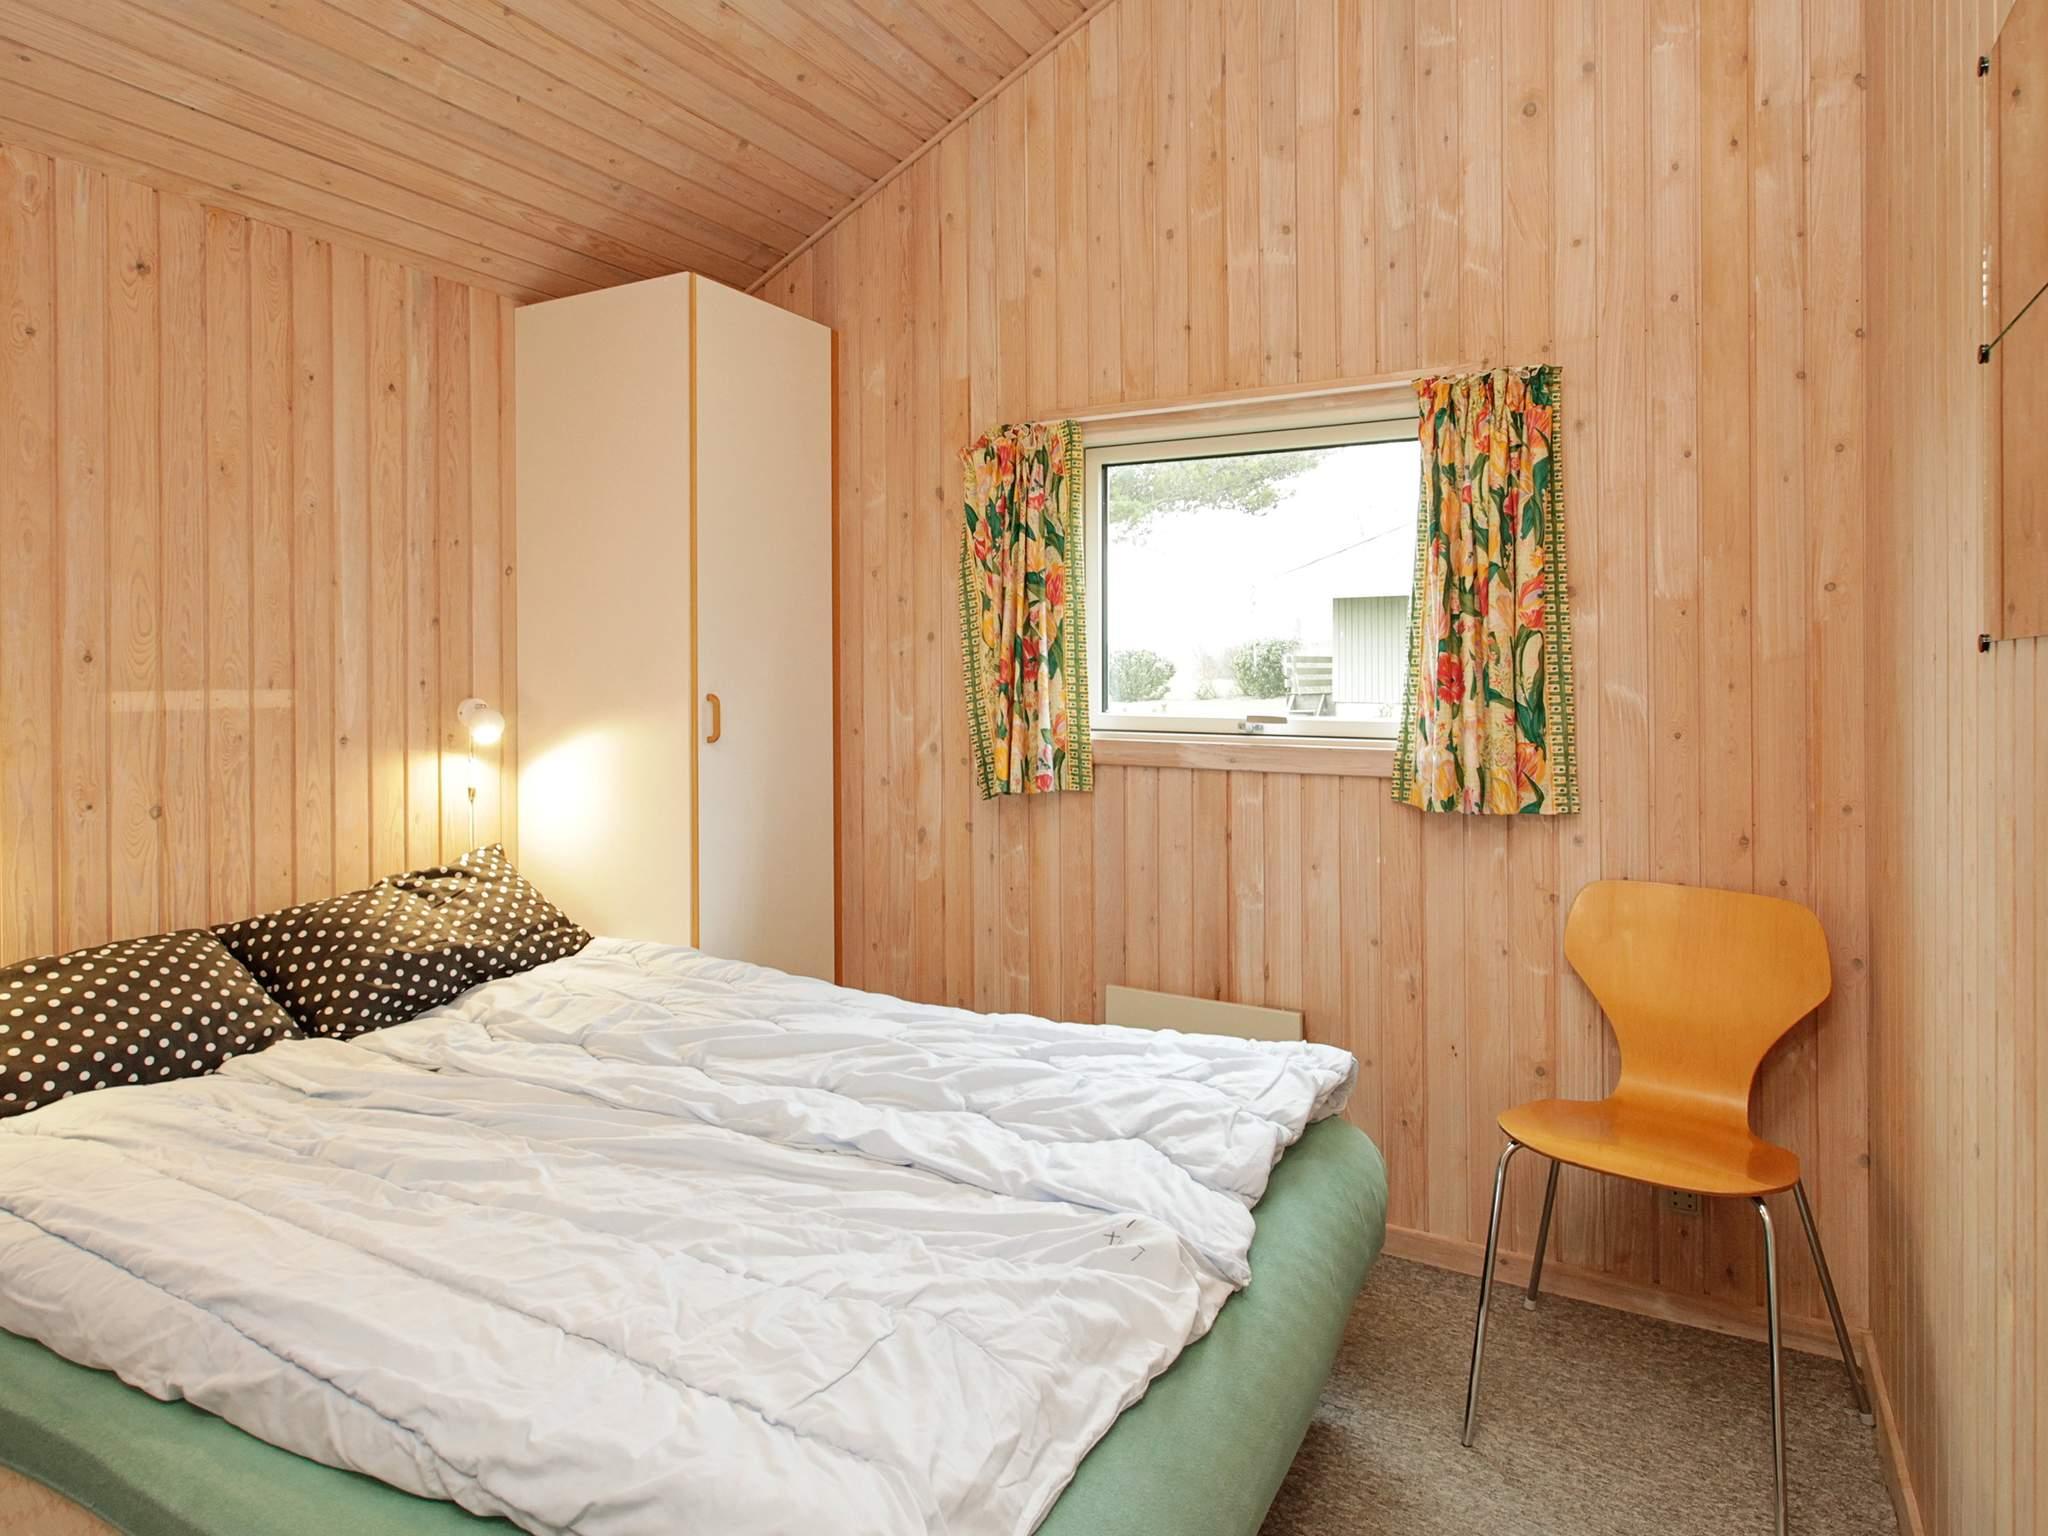 Ferienhaus Fredmosen (596960), Humble, , Langeland, Dänemark, Bild 13